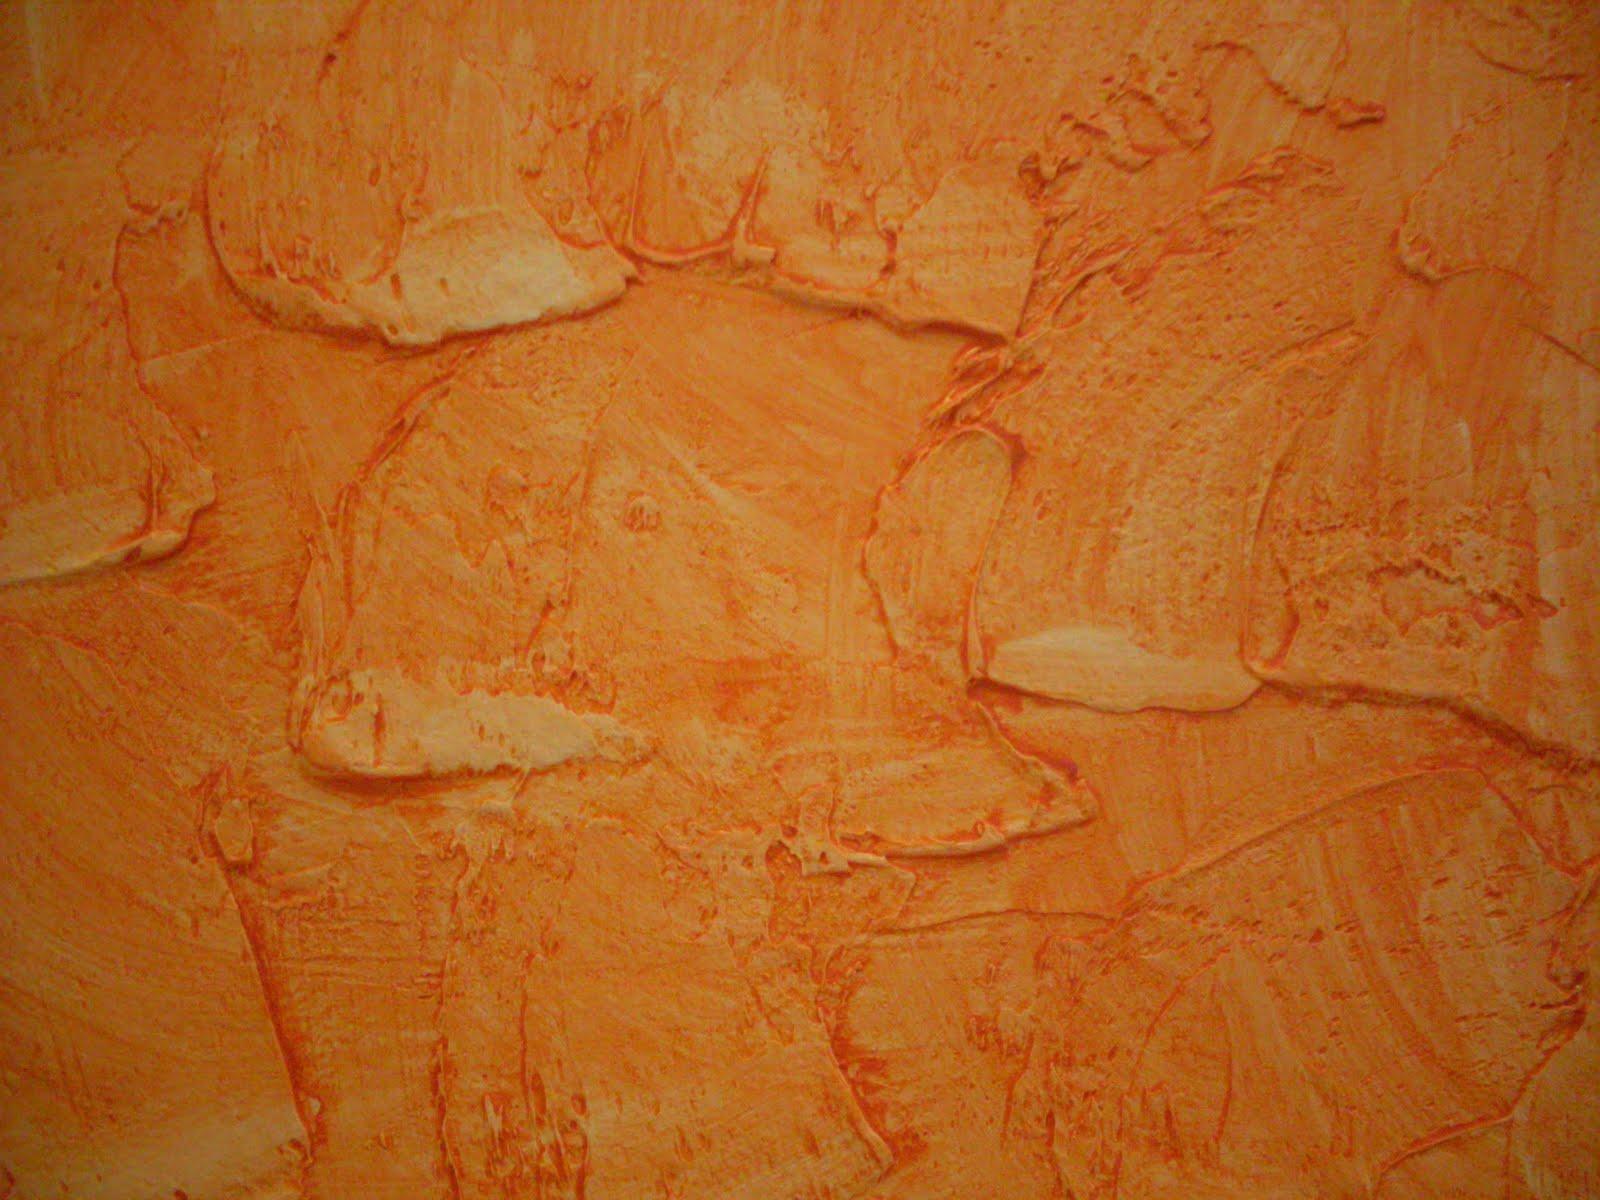 Pinturas em geral texturas paredes decorativas - Pinturas decorativas paredes ...